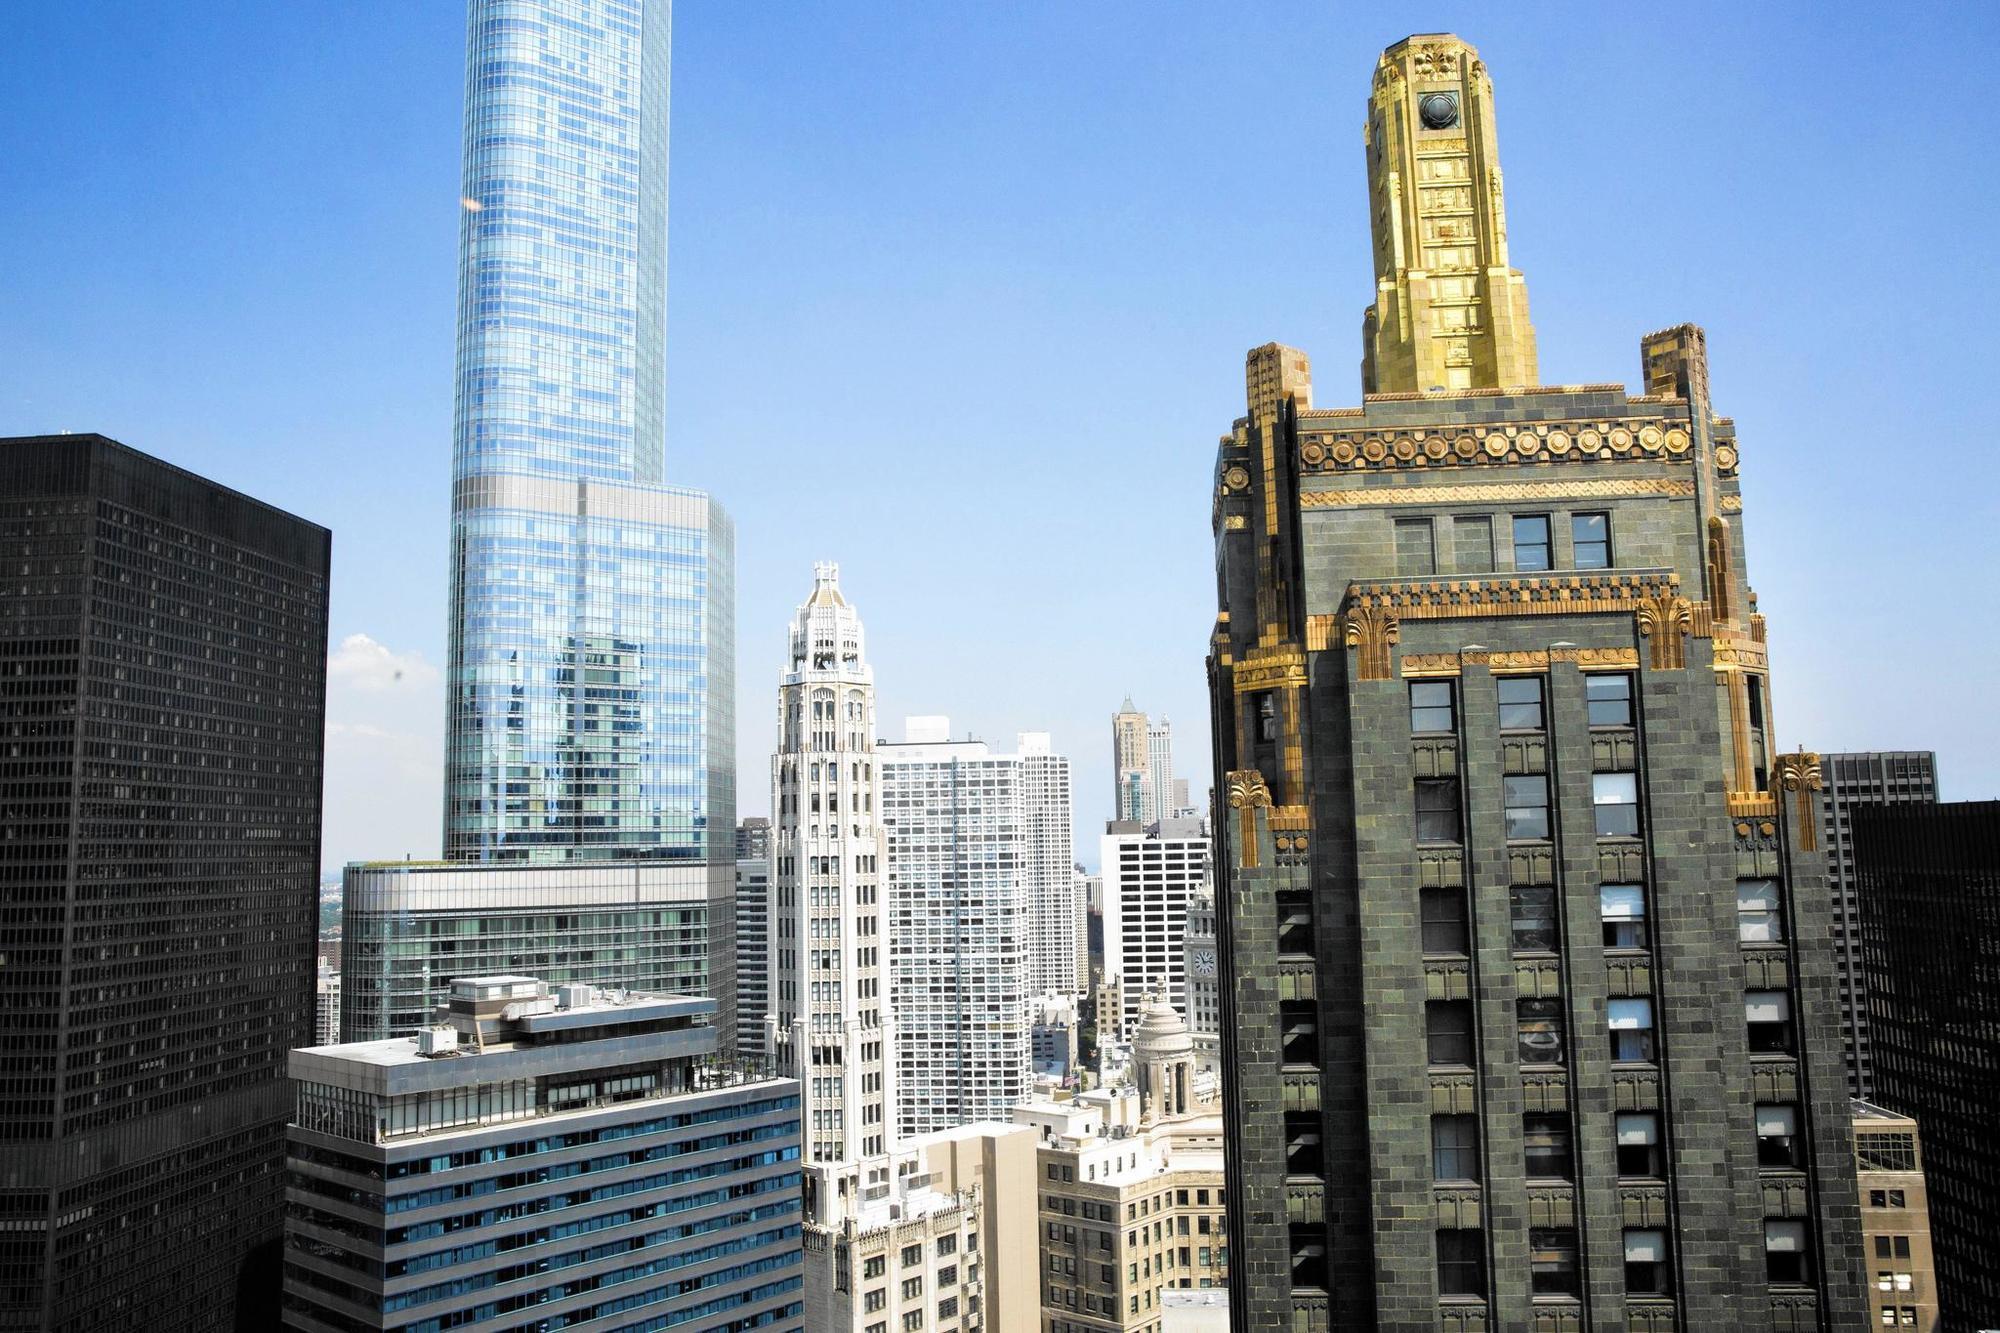 soontoopen st jane chicago now taking hotel